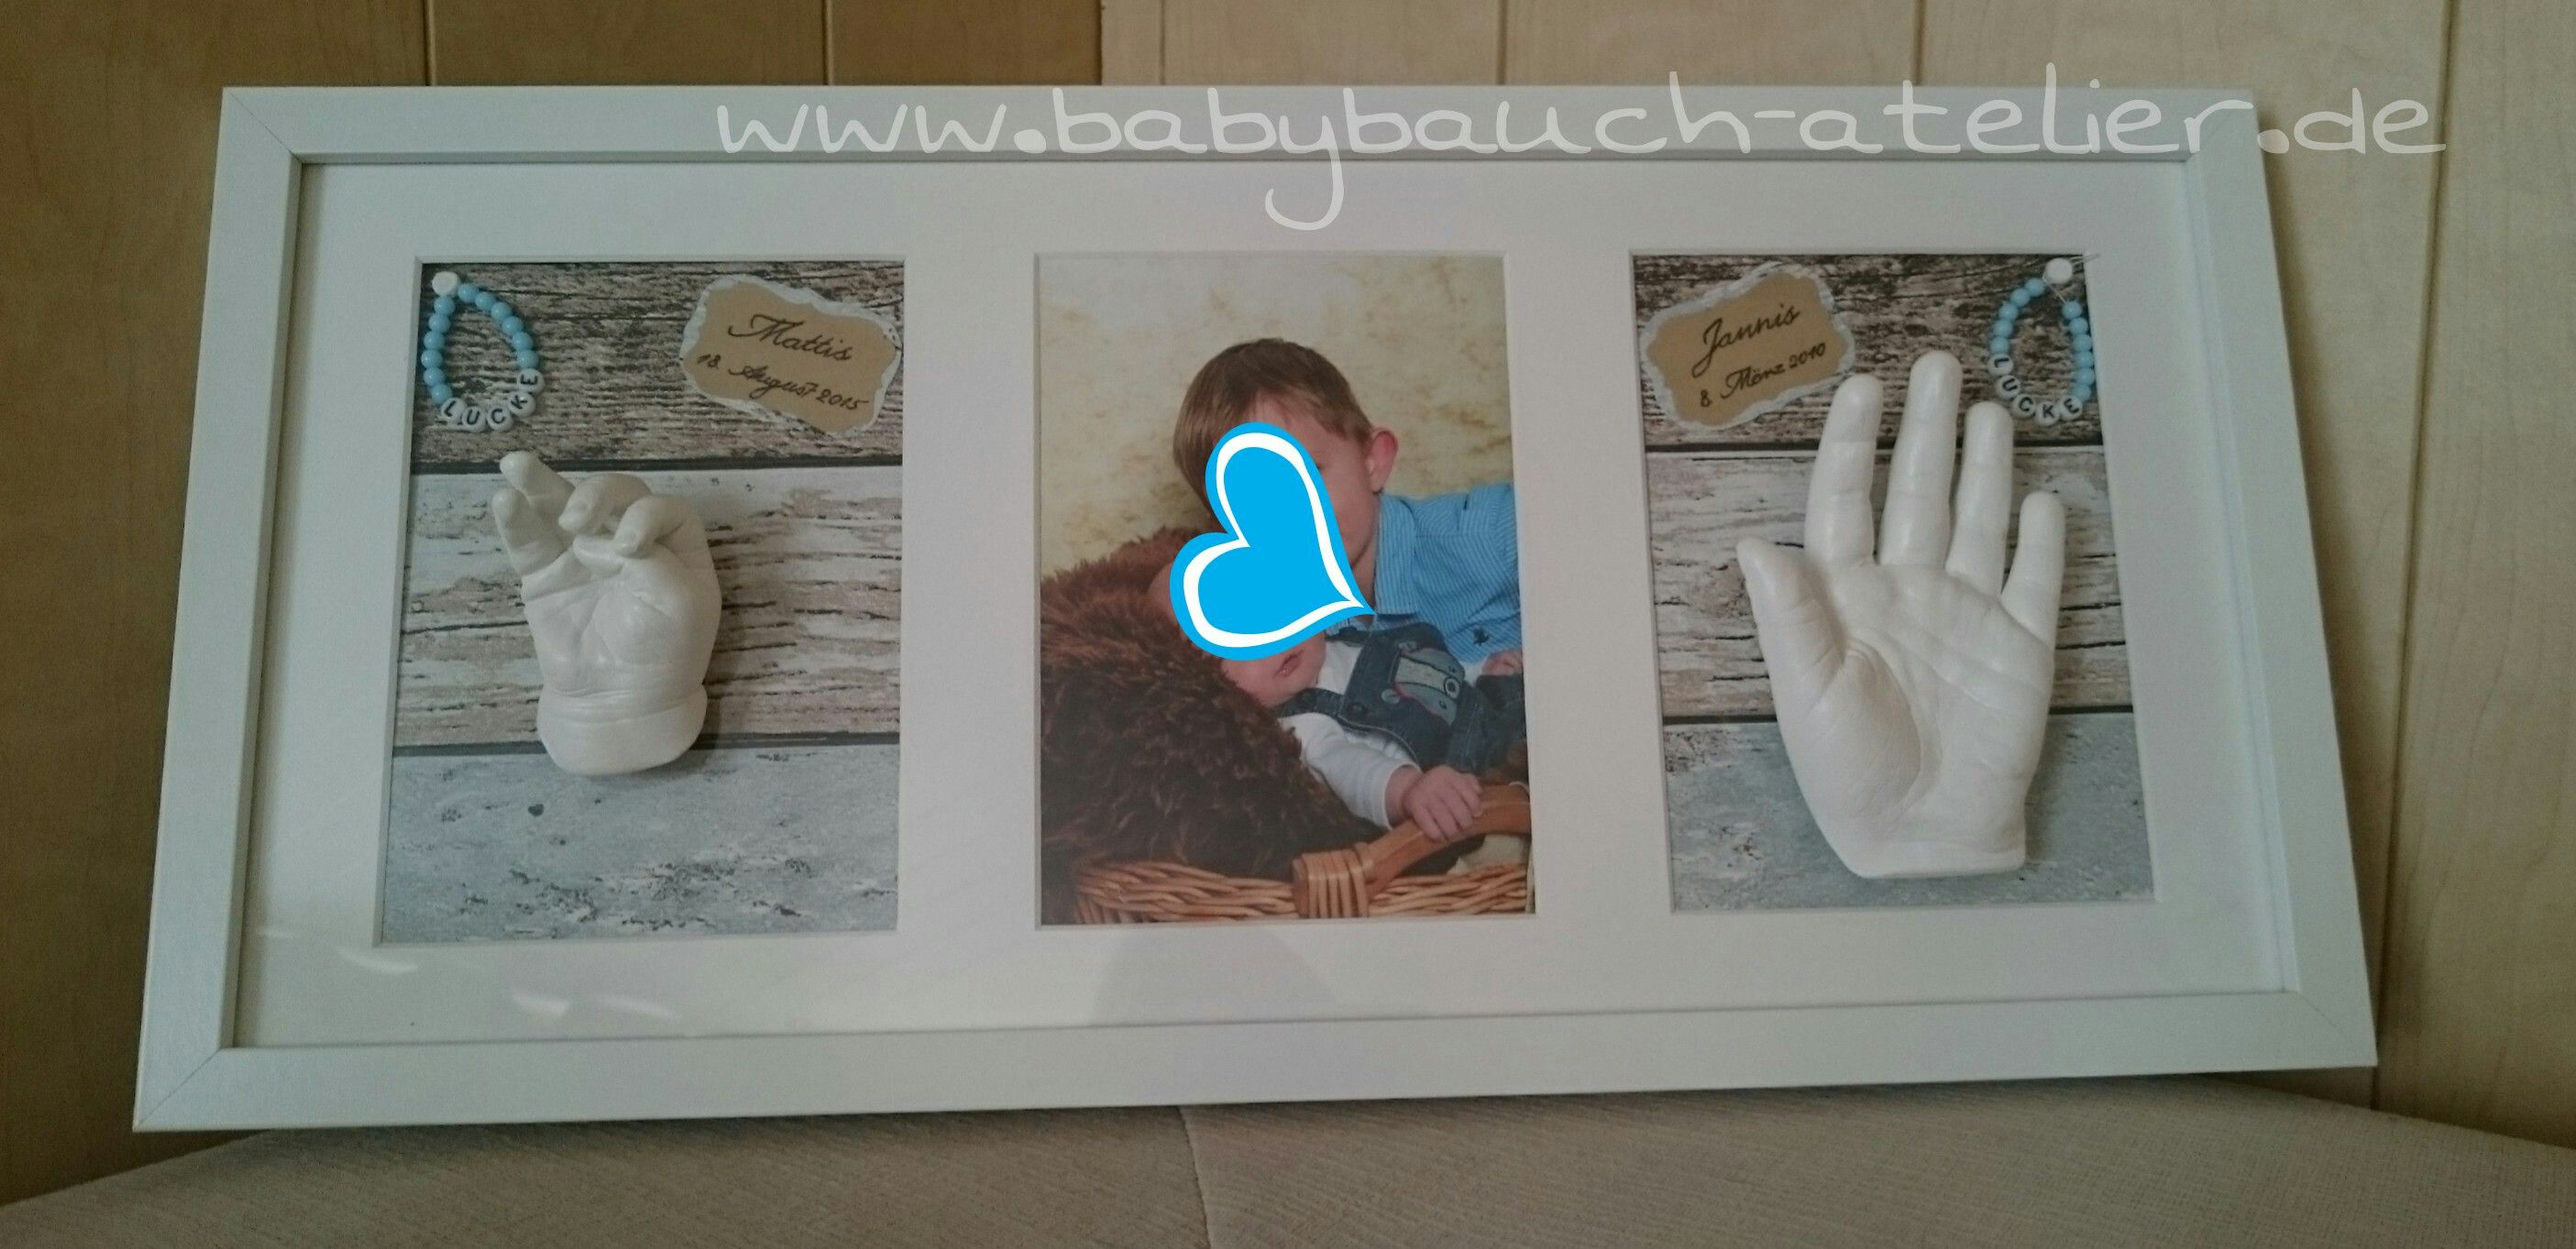 Baby 3D Abdruck Rahmen www.babybauch-atelier.de